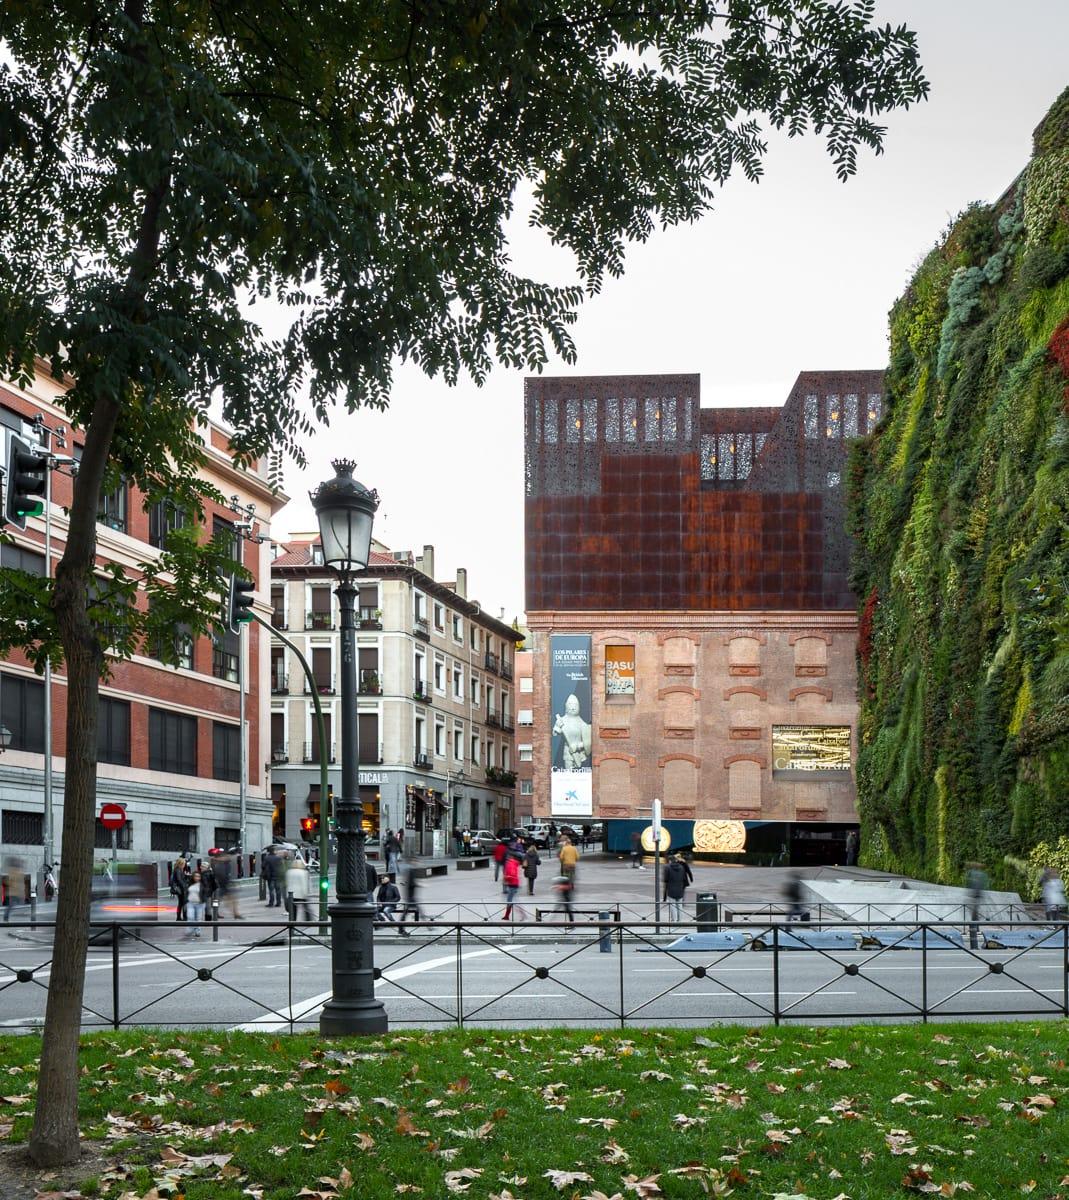 Herzog De Meuron Simon Garcia Arqfoto Caixa Forum Madrid Divisare